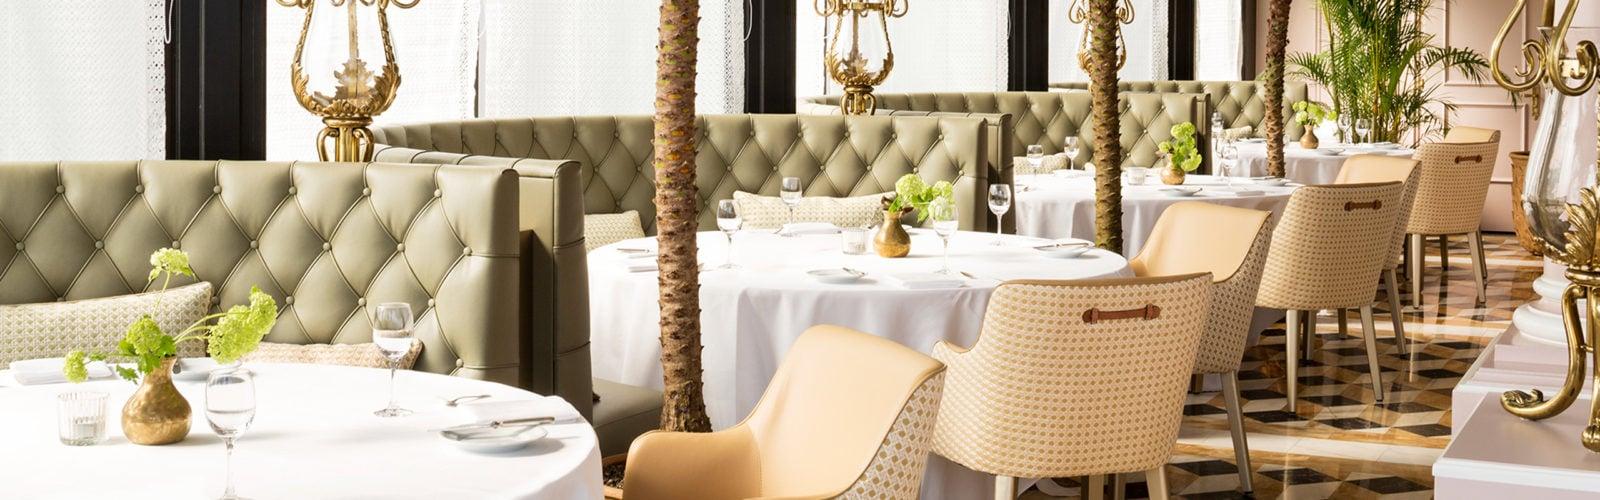 victoria-jungfrau-restaurant-2